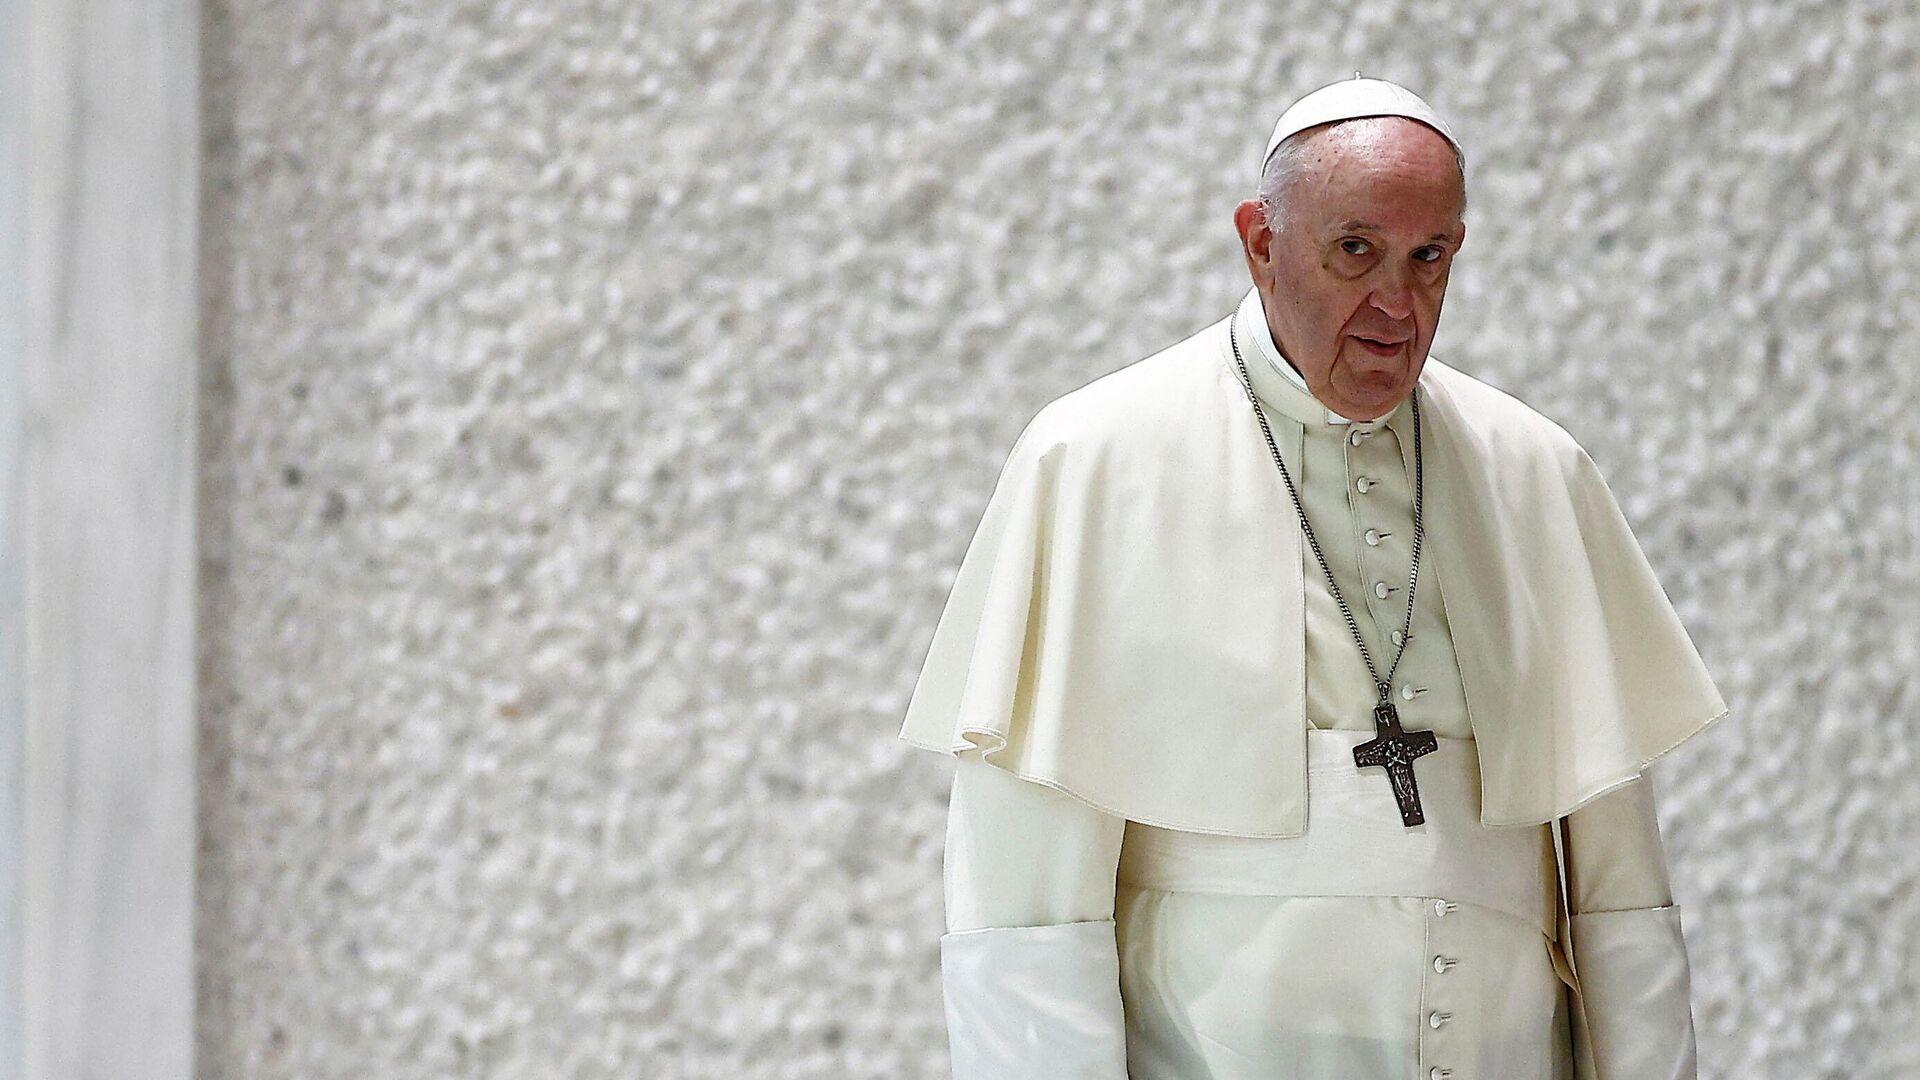 El papa Francisco - Sputnik Mundo, 1920, 27.09.2021